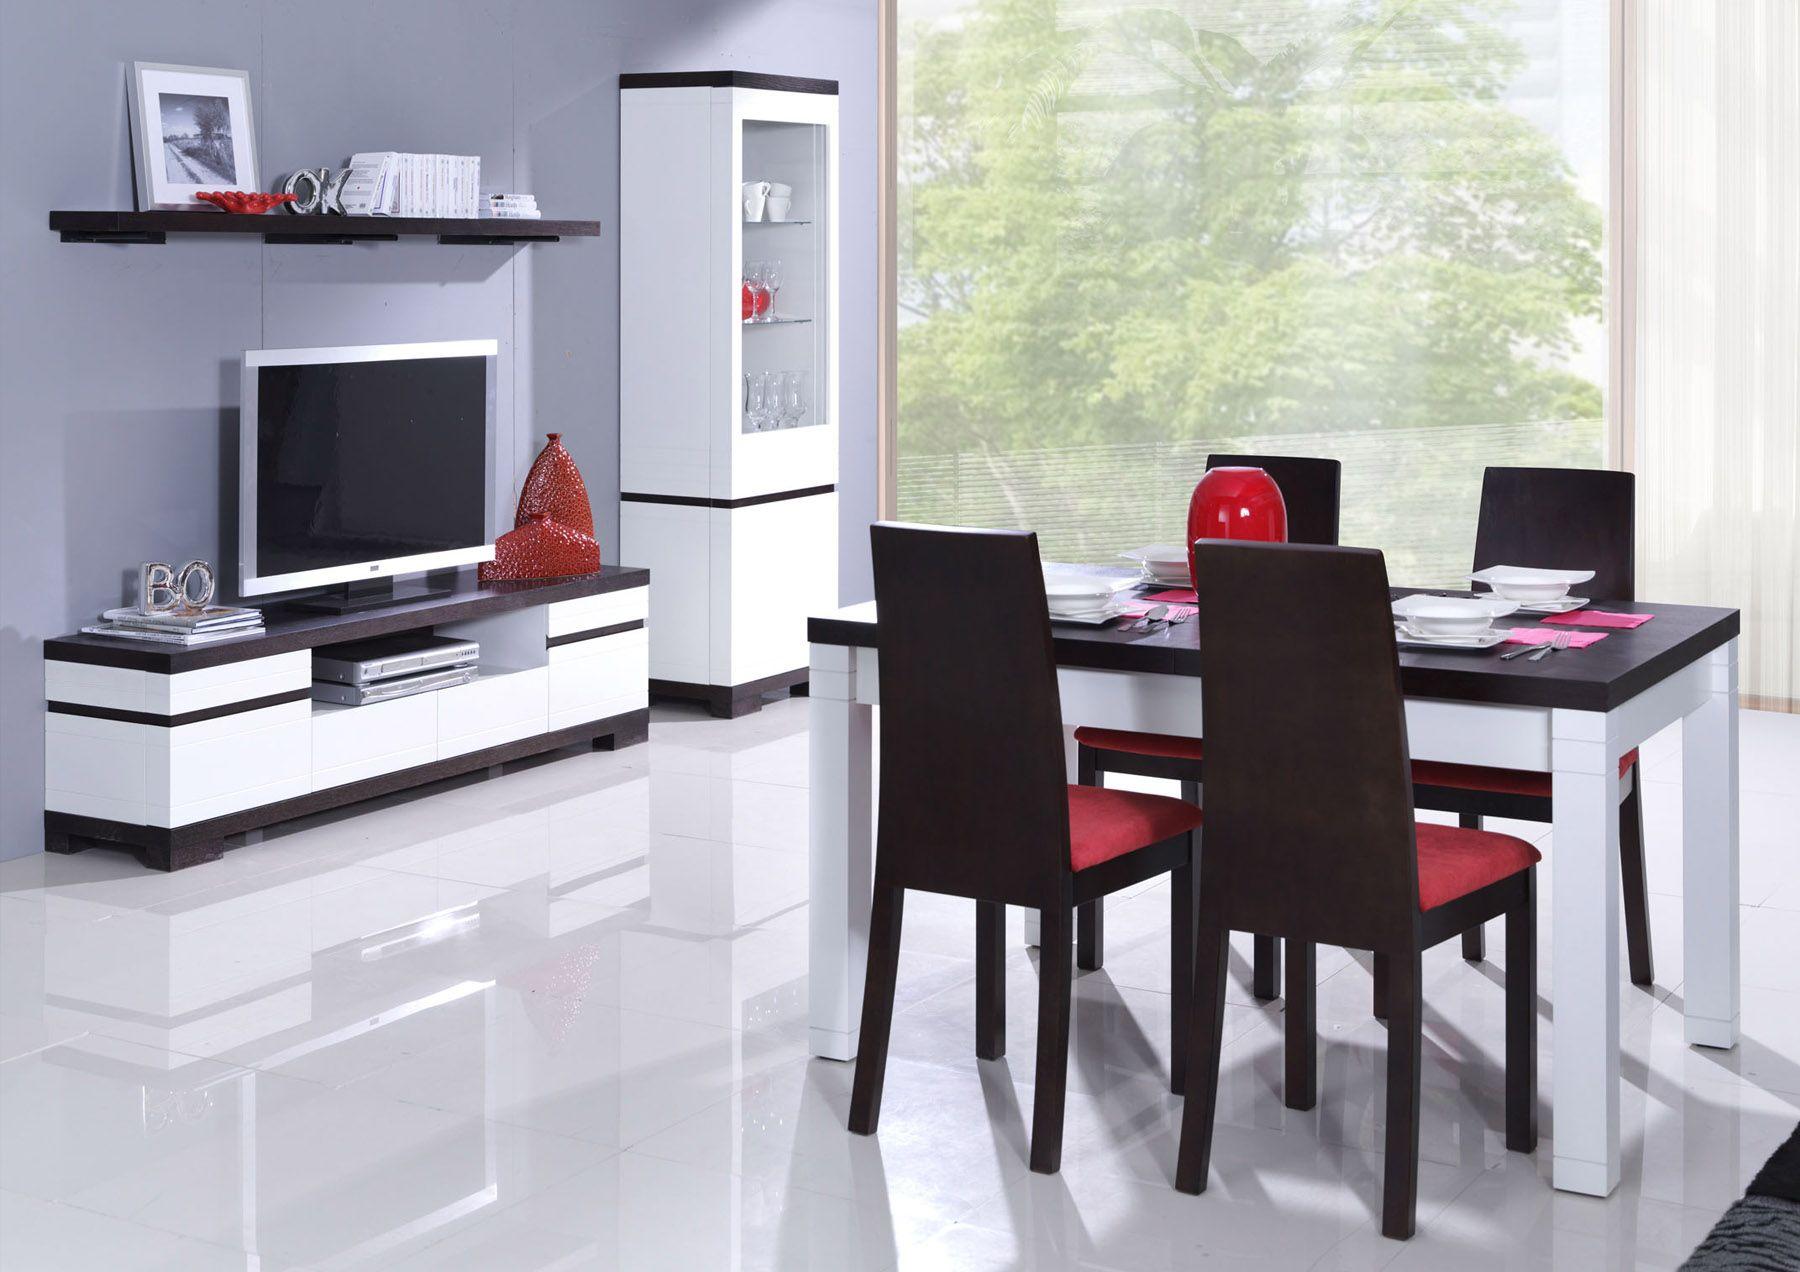 Goedkope Design Meubels.Moderne Wandmeubels Modern Tv Wandmeubels Design Meubels